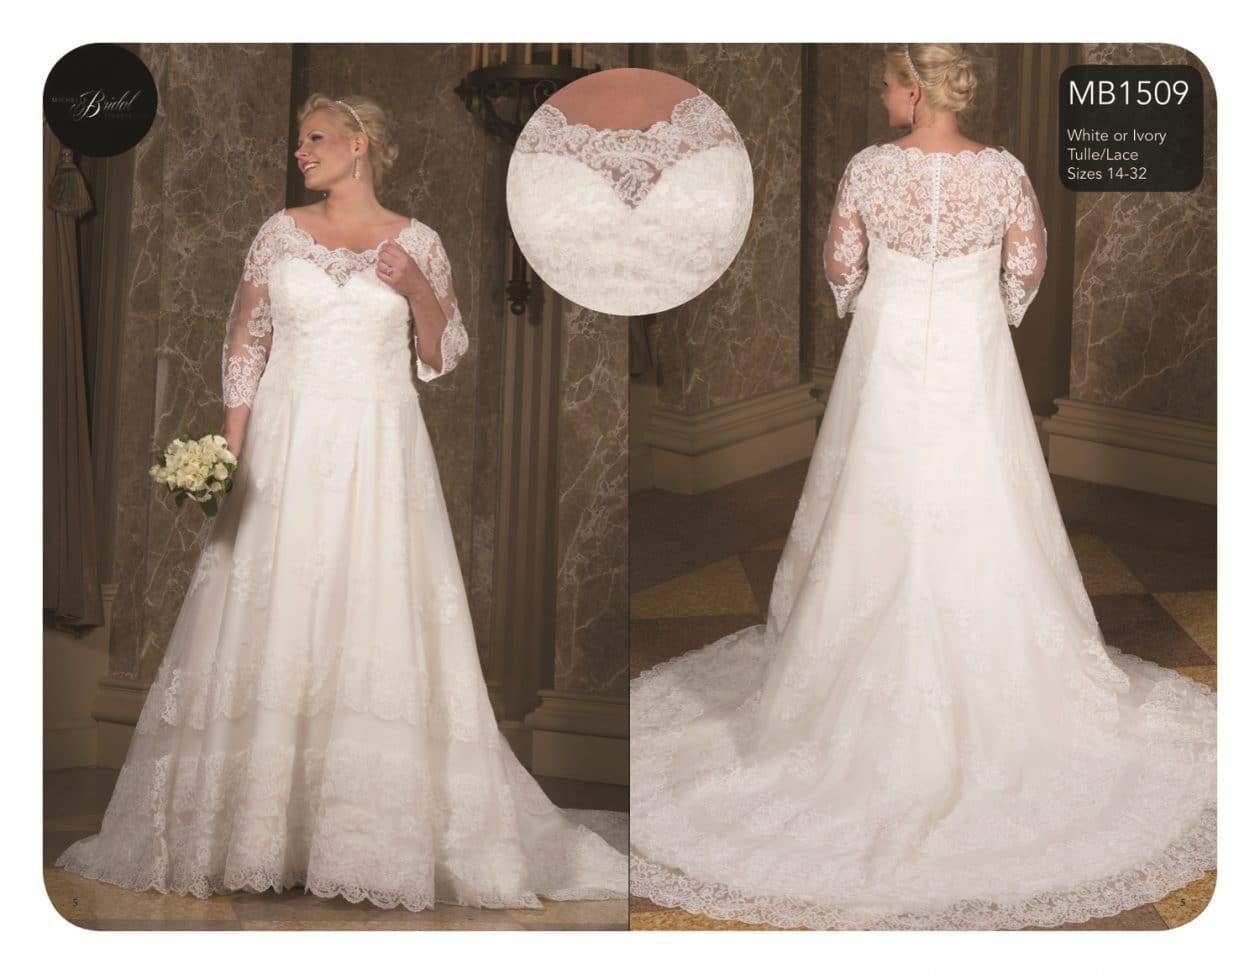 Plus Size Bridal with Sydney's Closet on TheCurvyFashionista.com